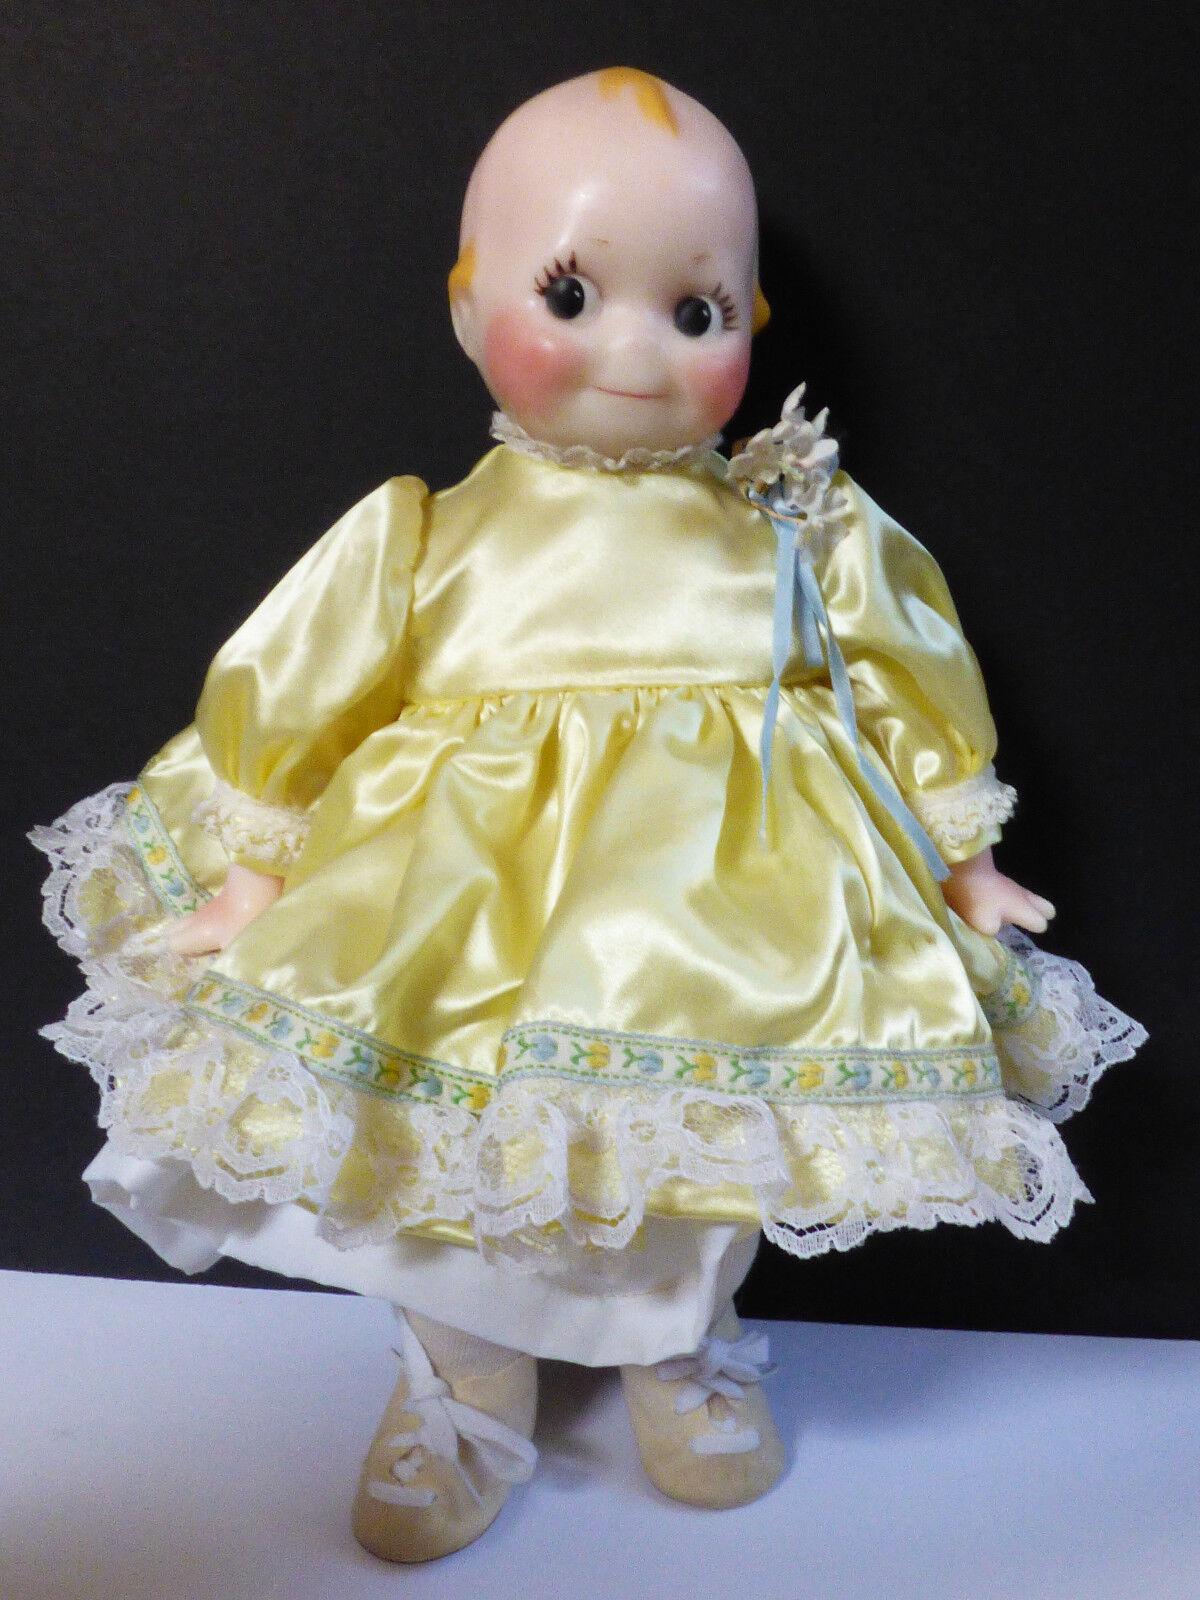 Lewis Sorensen Original 1982 Wax Doll hand made Kewpie in yellow dress 15  L.Ed.